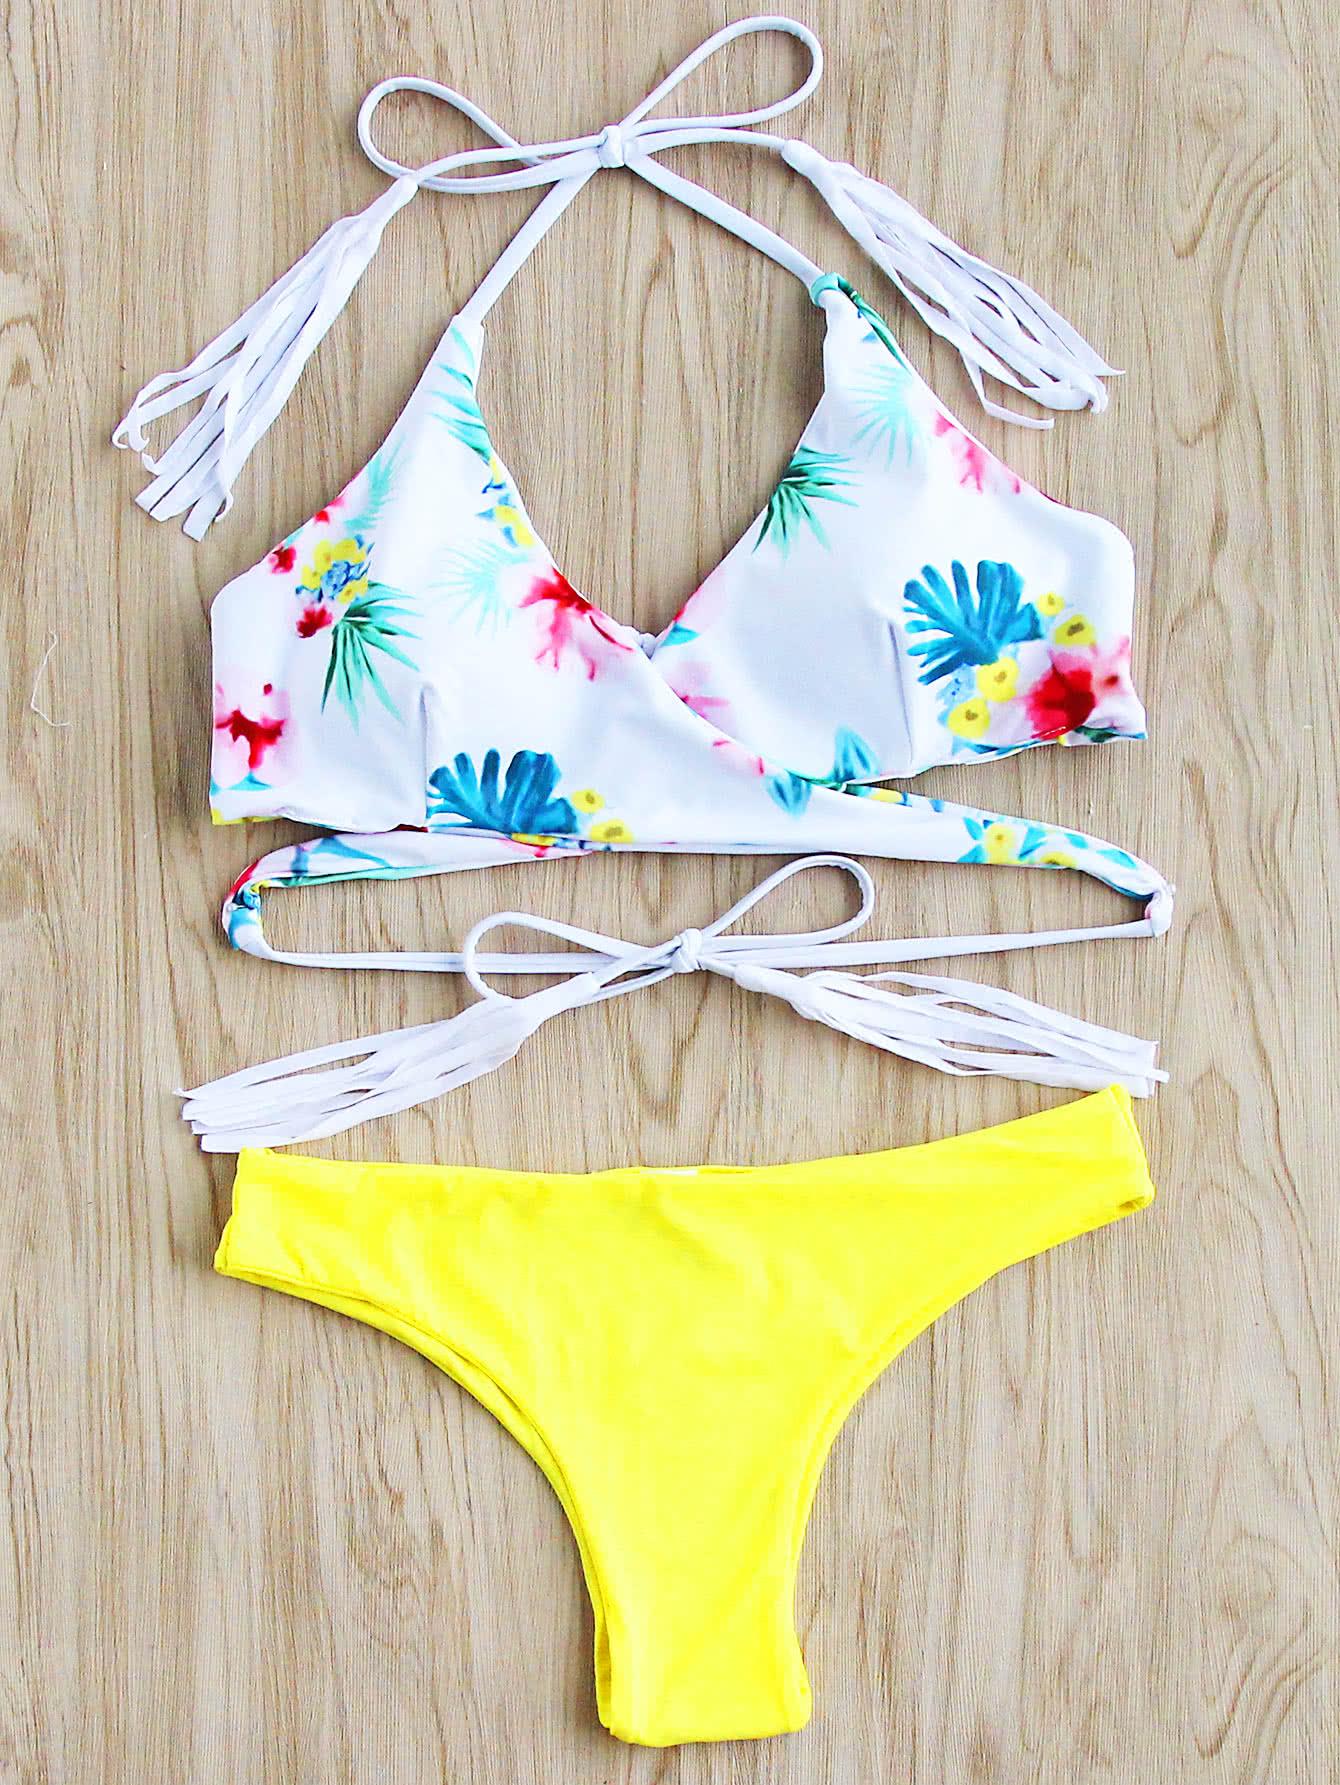 Calico Print Tassel Tie Wrap Bikini Set swimwear170523311